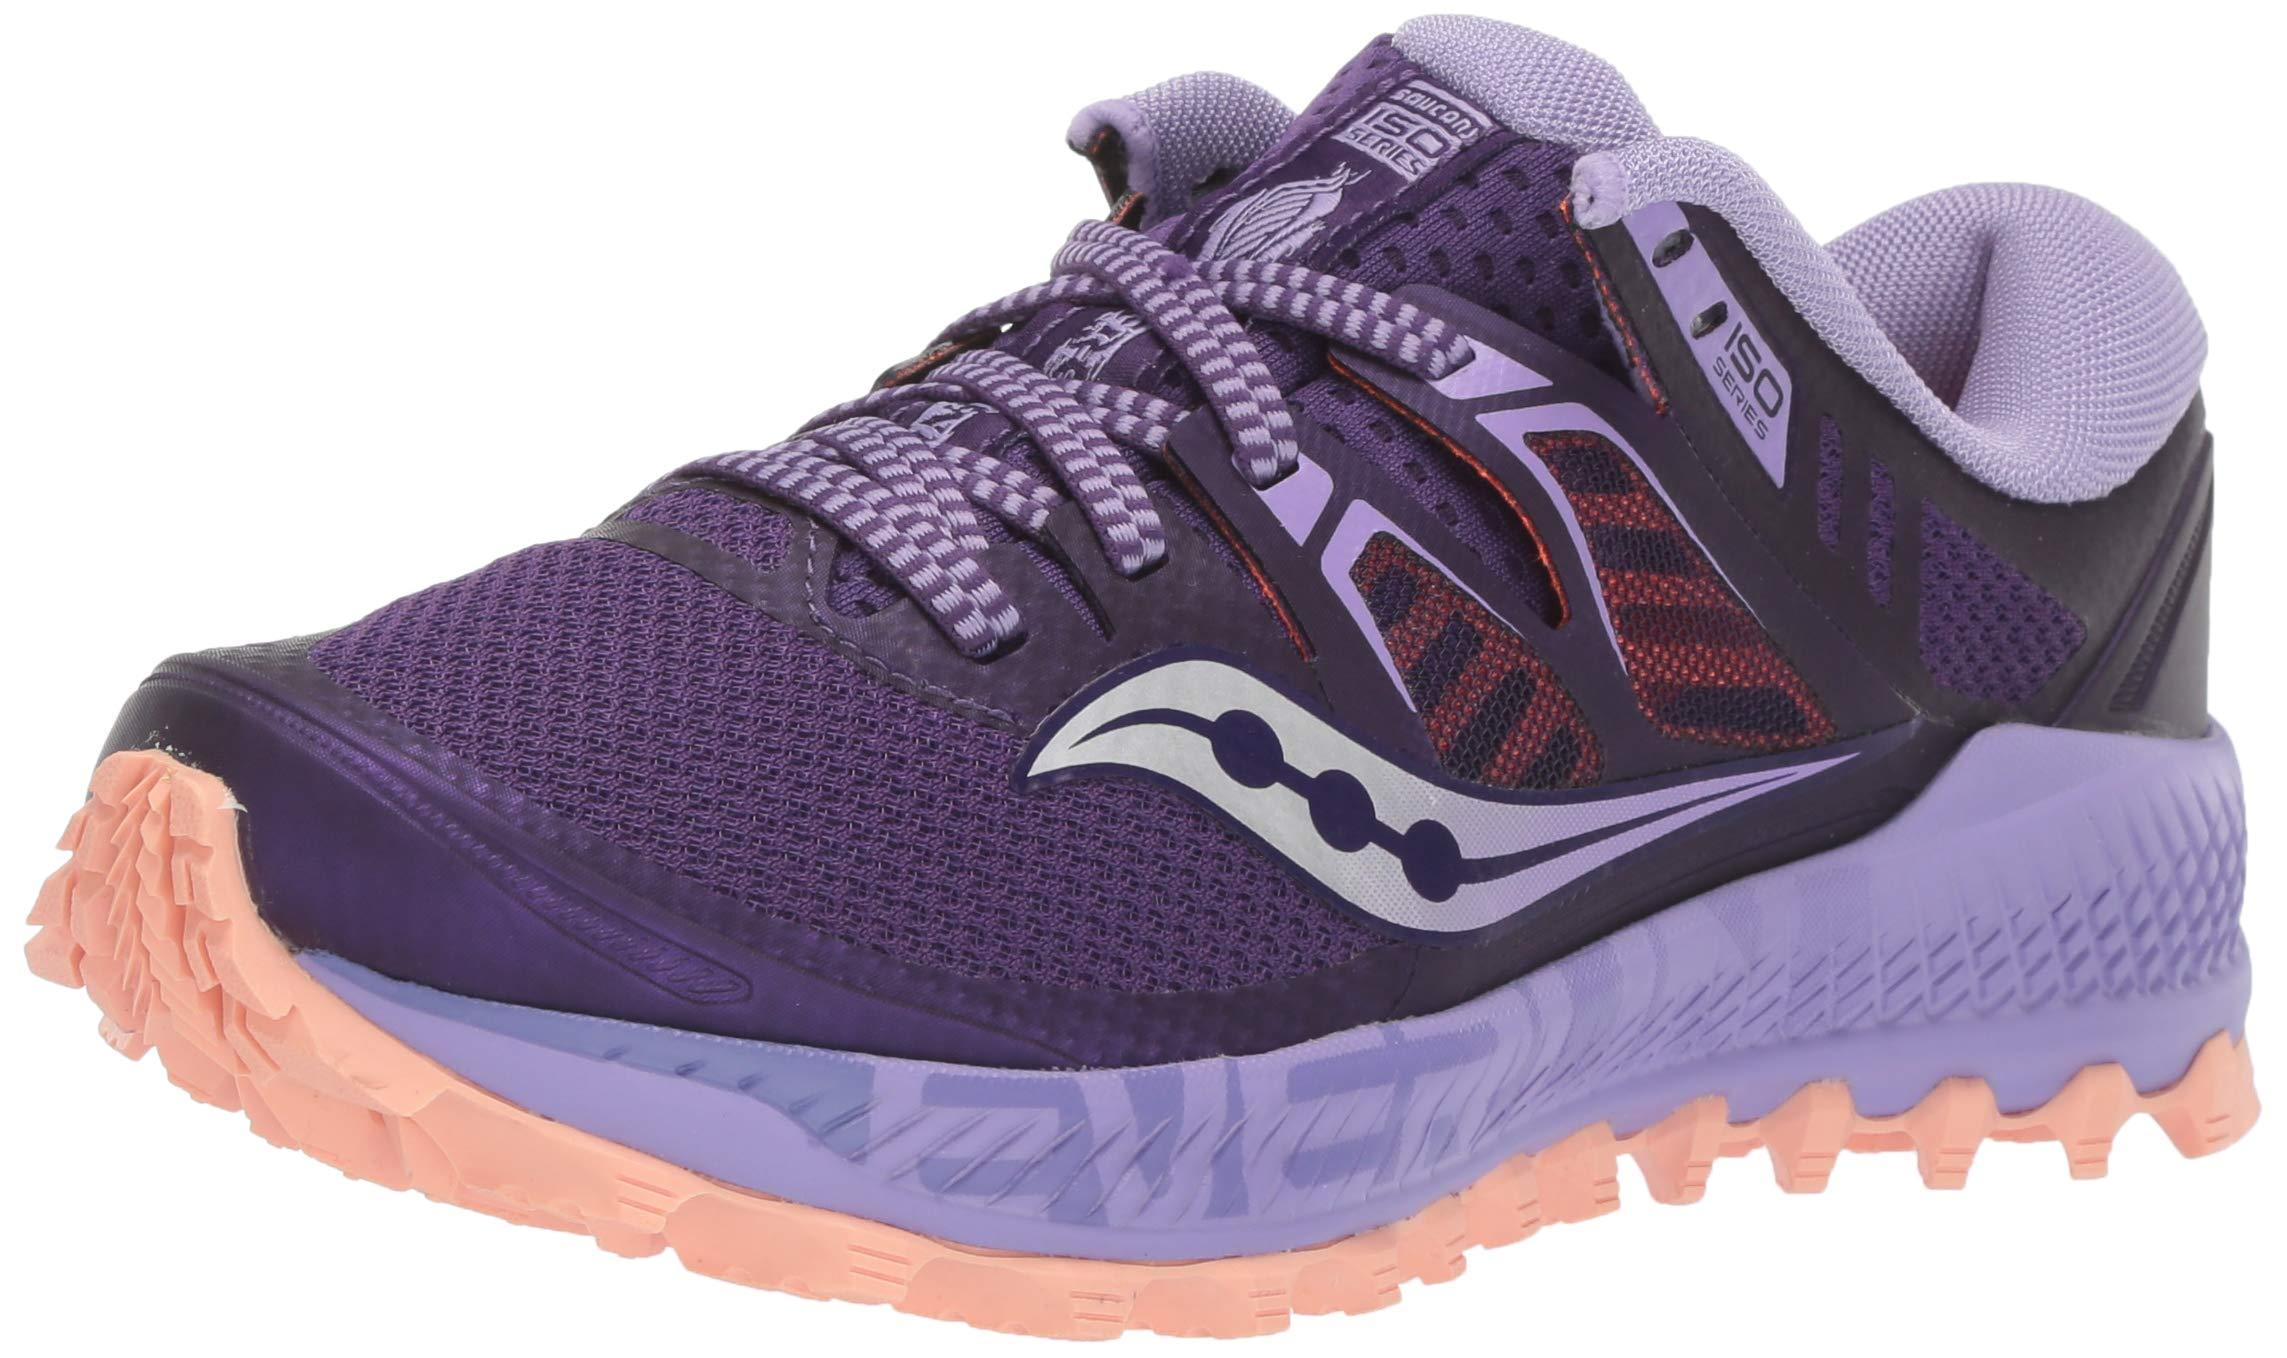 Saucony Women's Peregrine ISO Road Running Shoe, Purple/Peach, 5 M US